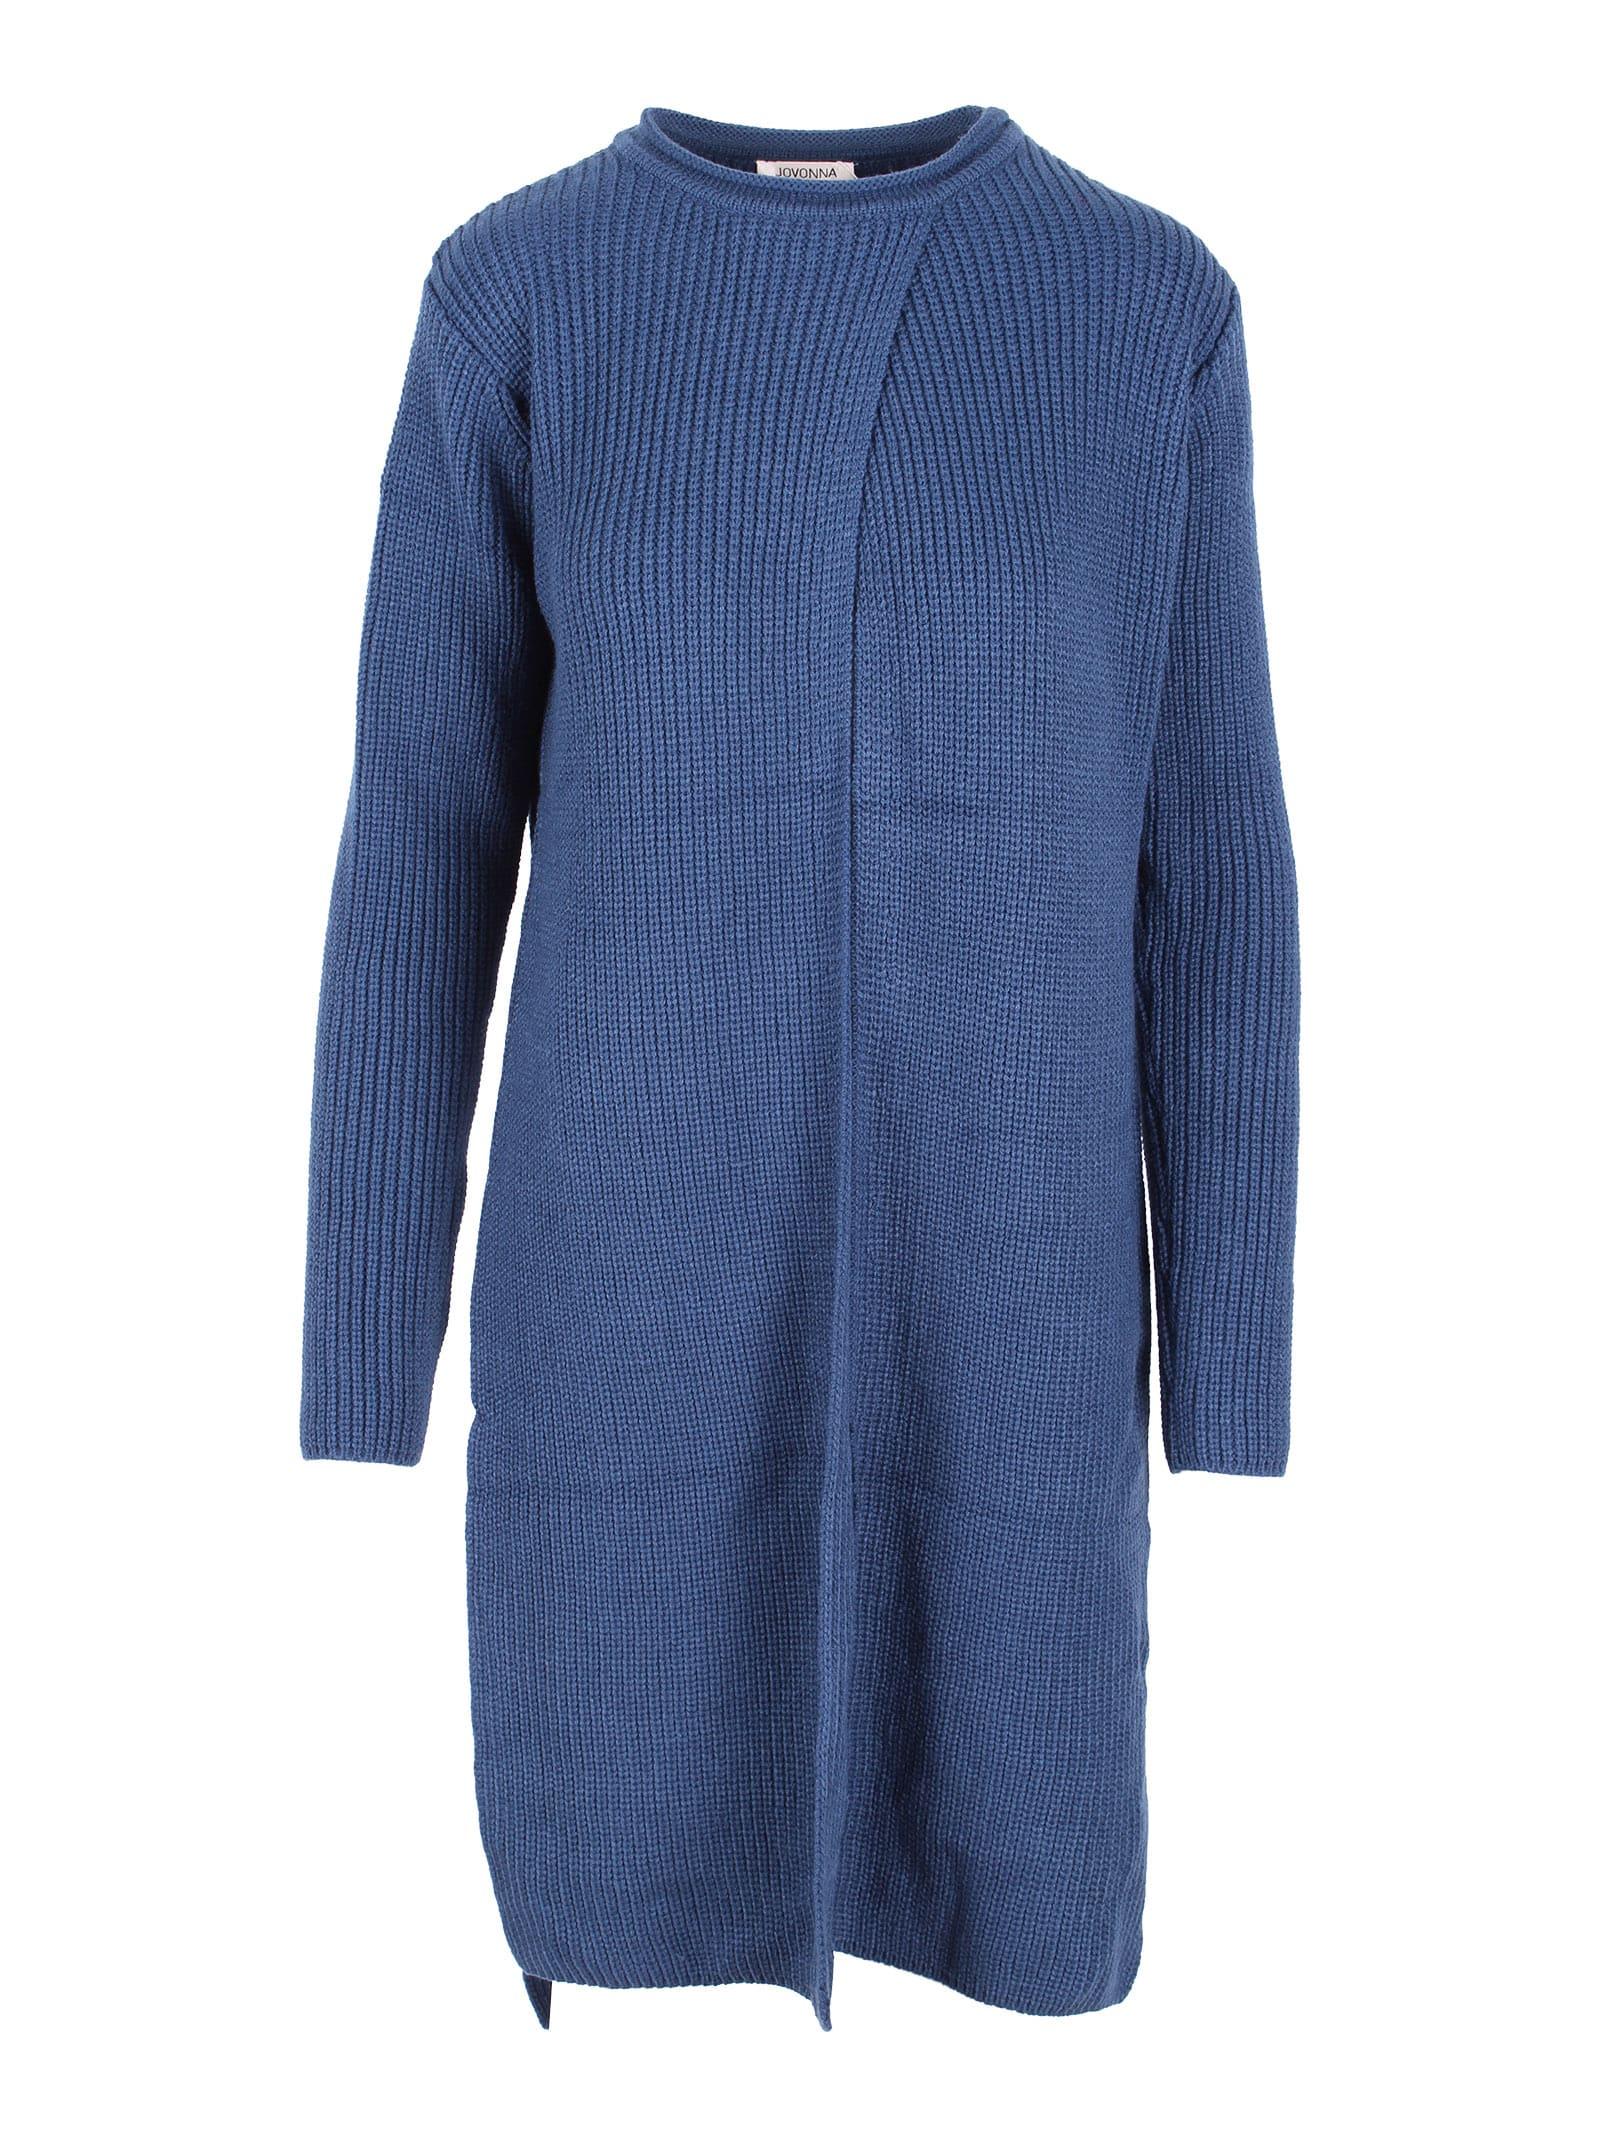 London cafune Viscose Sweater